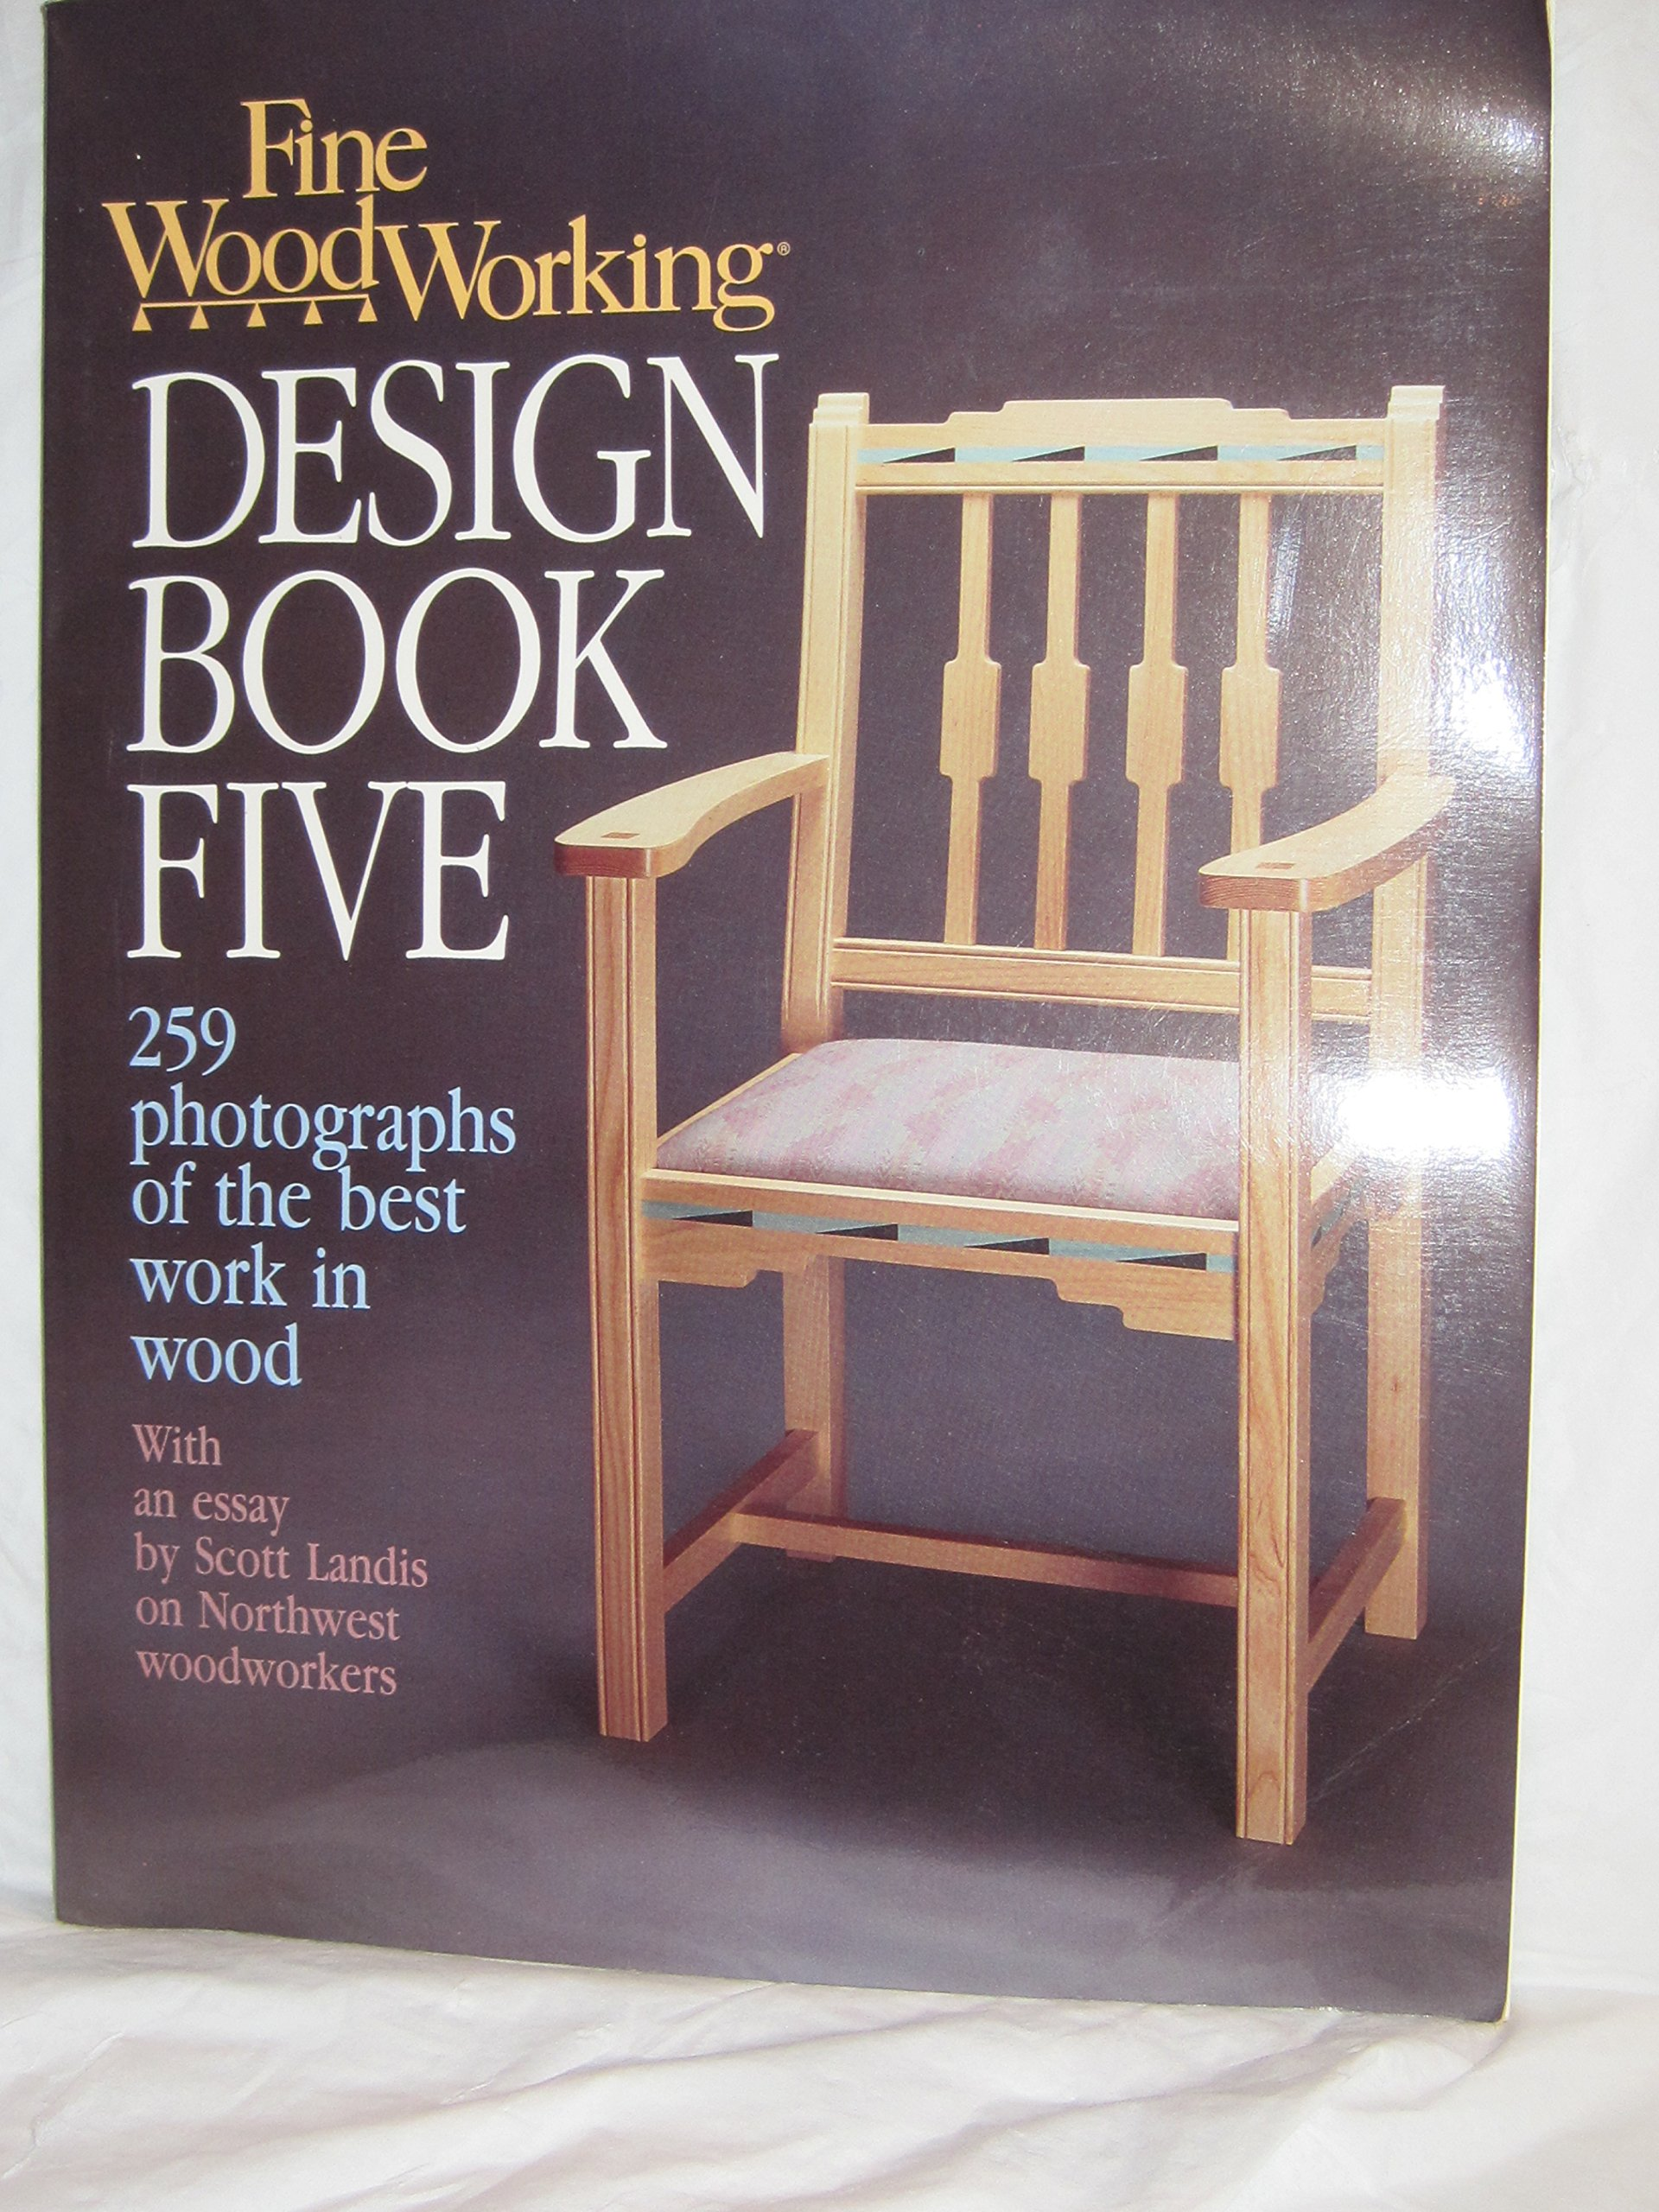 Fine Woodworking Design Book Five Editors Of Fine Woodworking 9780942391282 Amazon Com Books